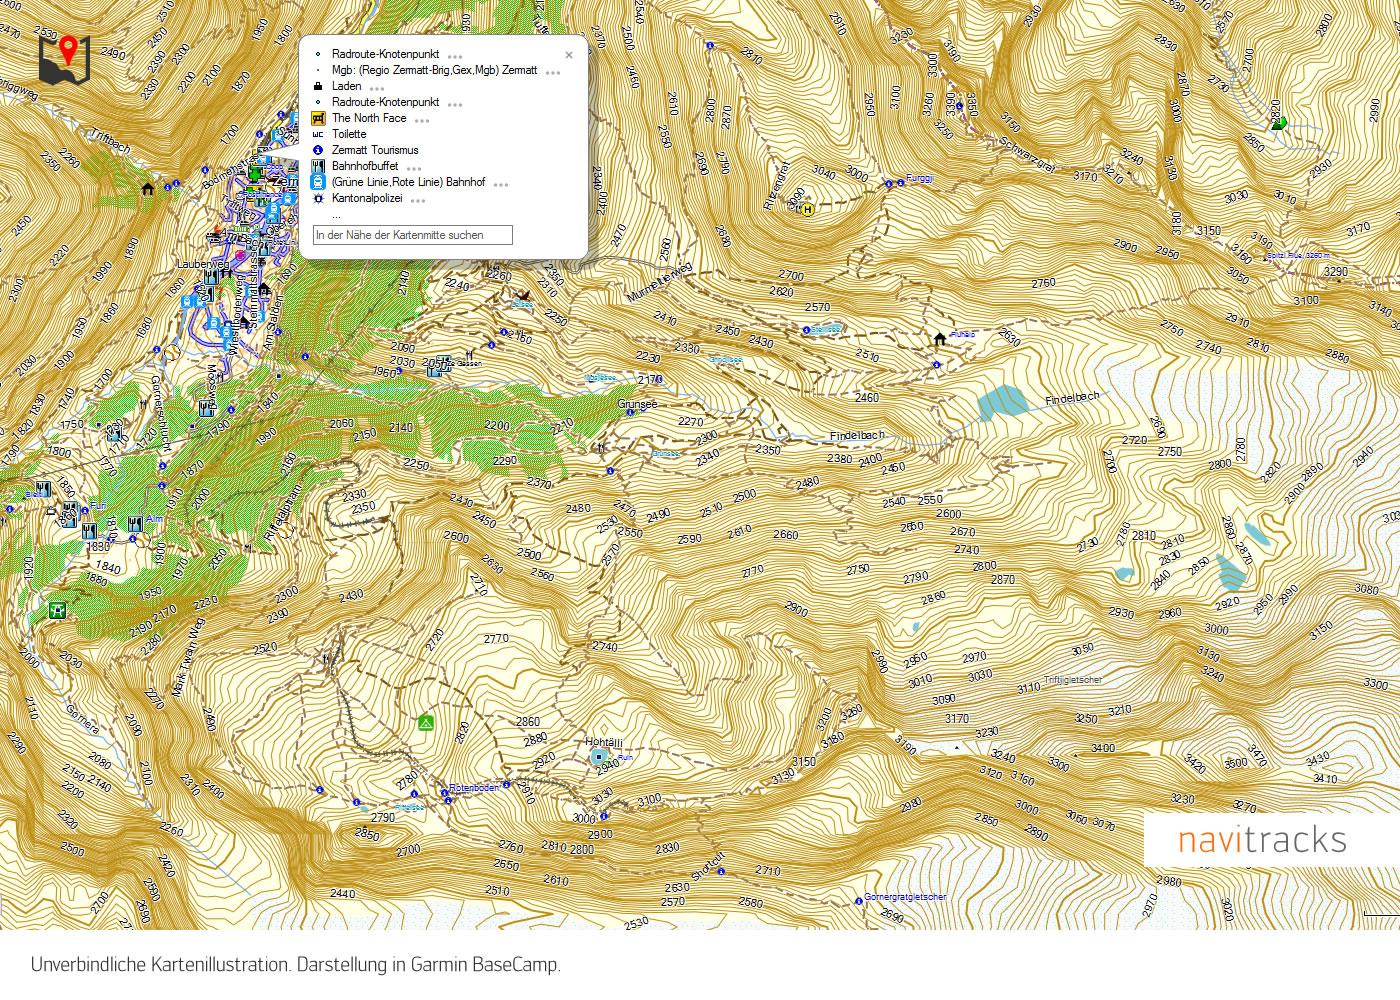 Chile Topo Gps Karte Garmin 10m Srtm Hohenlinien 8gb Microsd